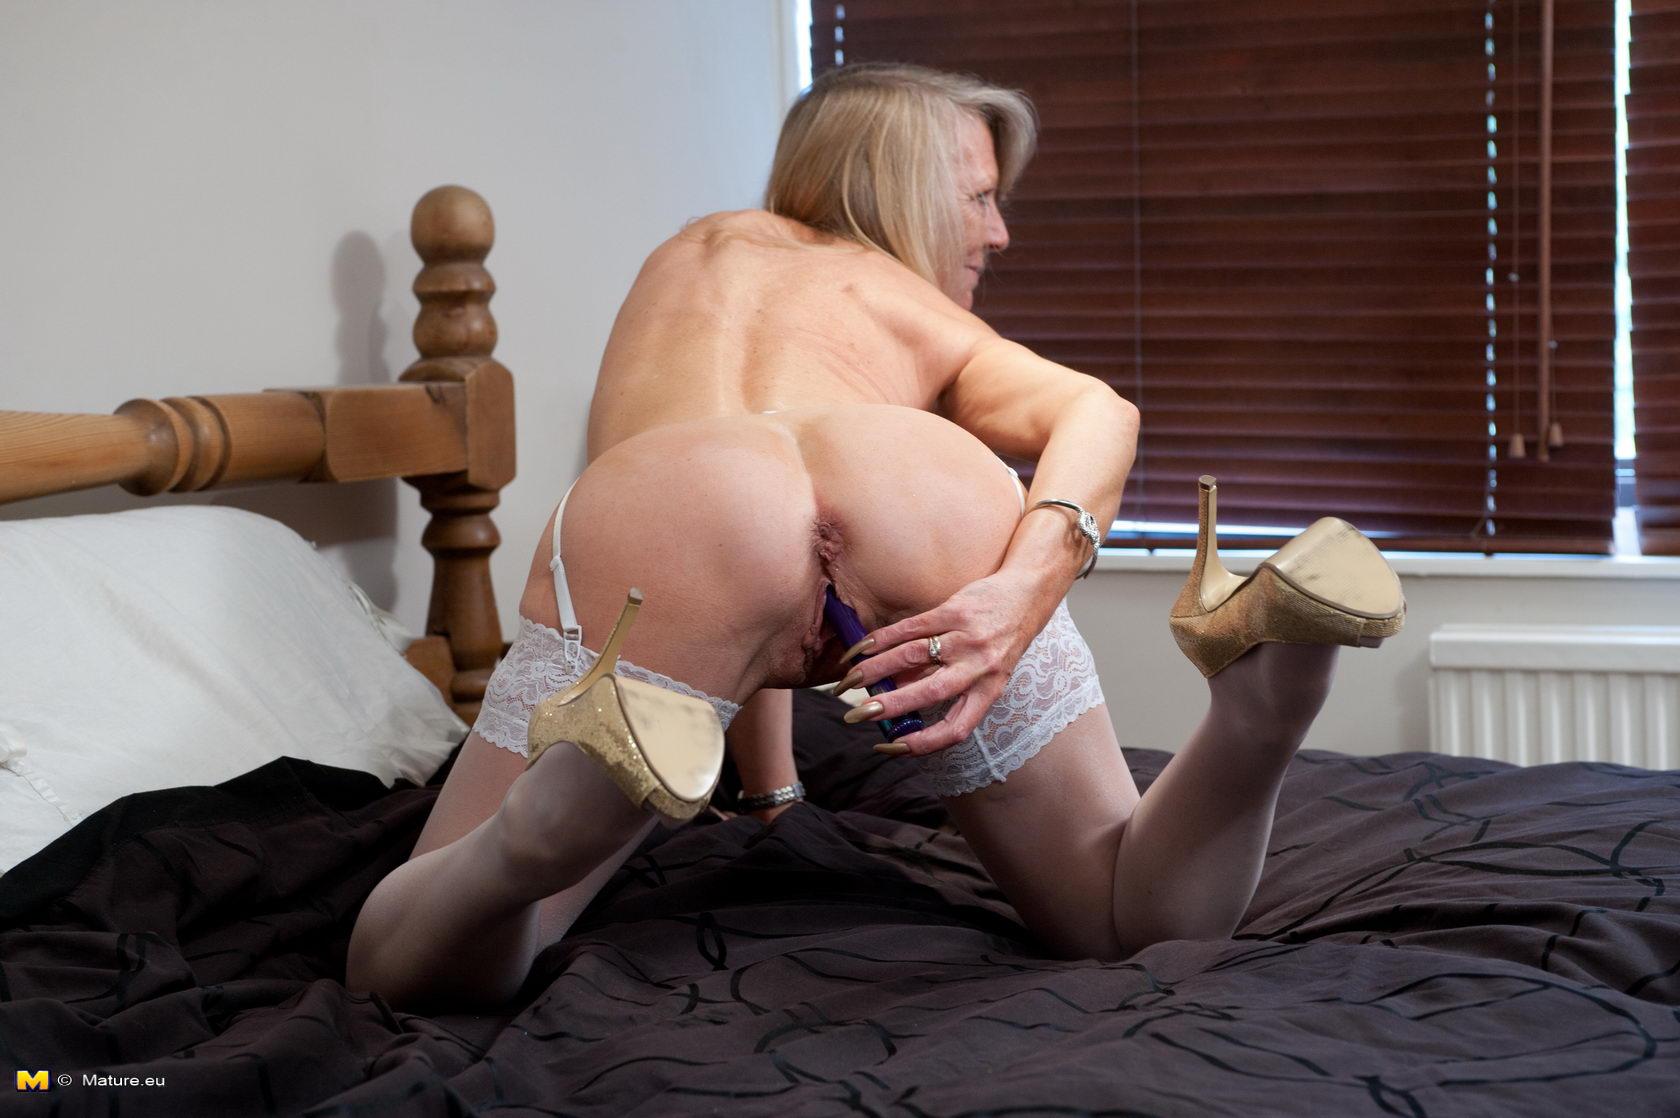 Mature stocking slut pussy play